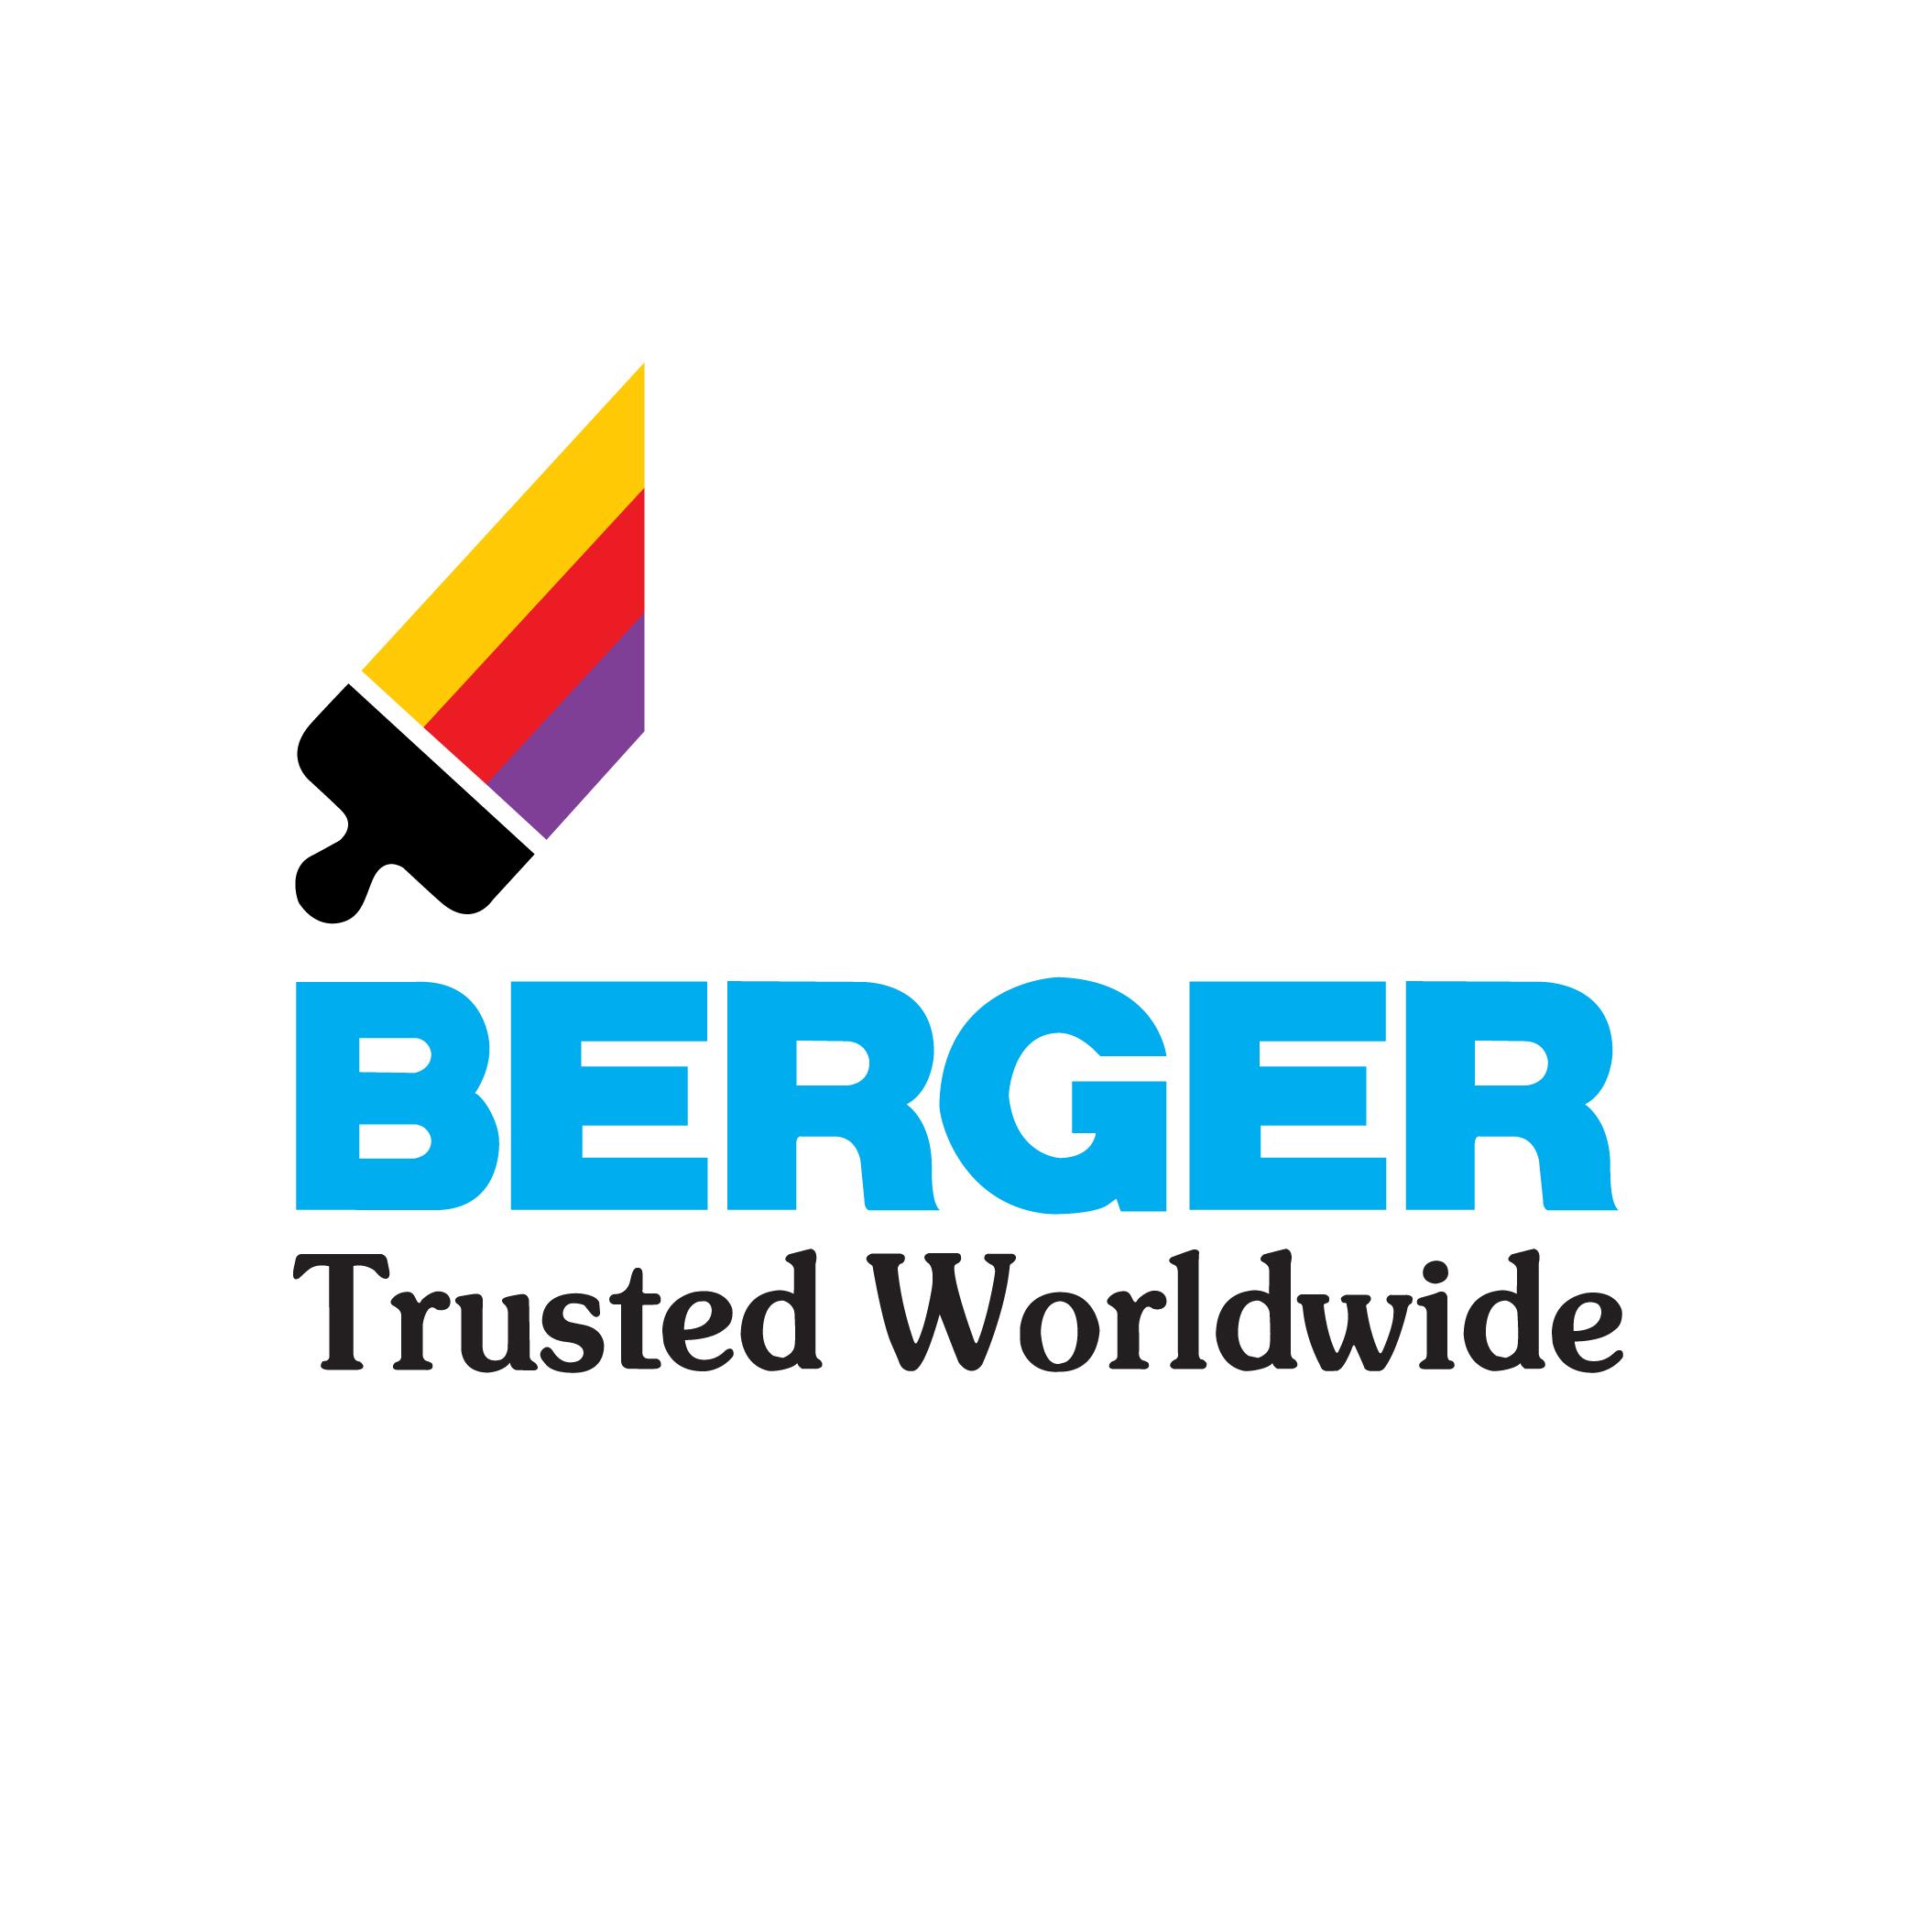 BERGER Color.jpg